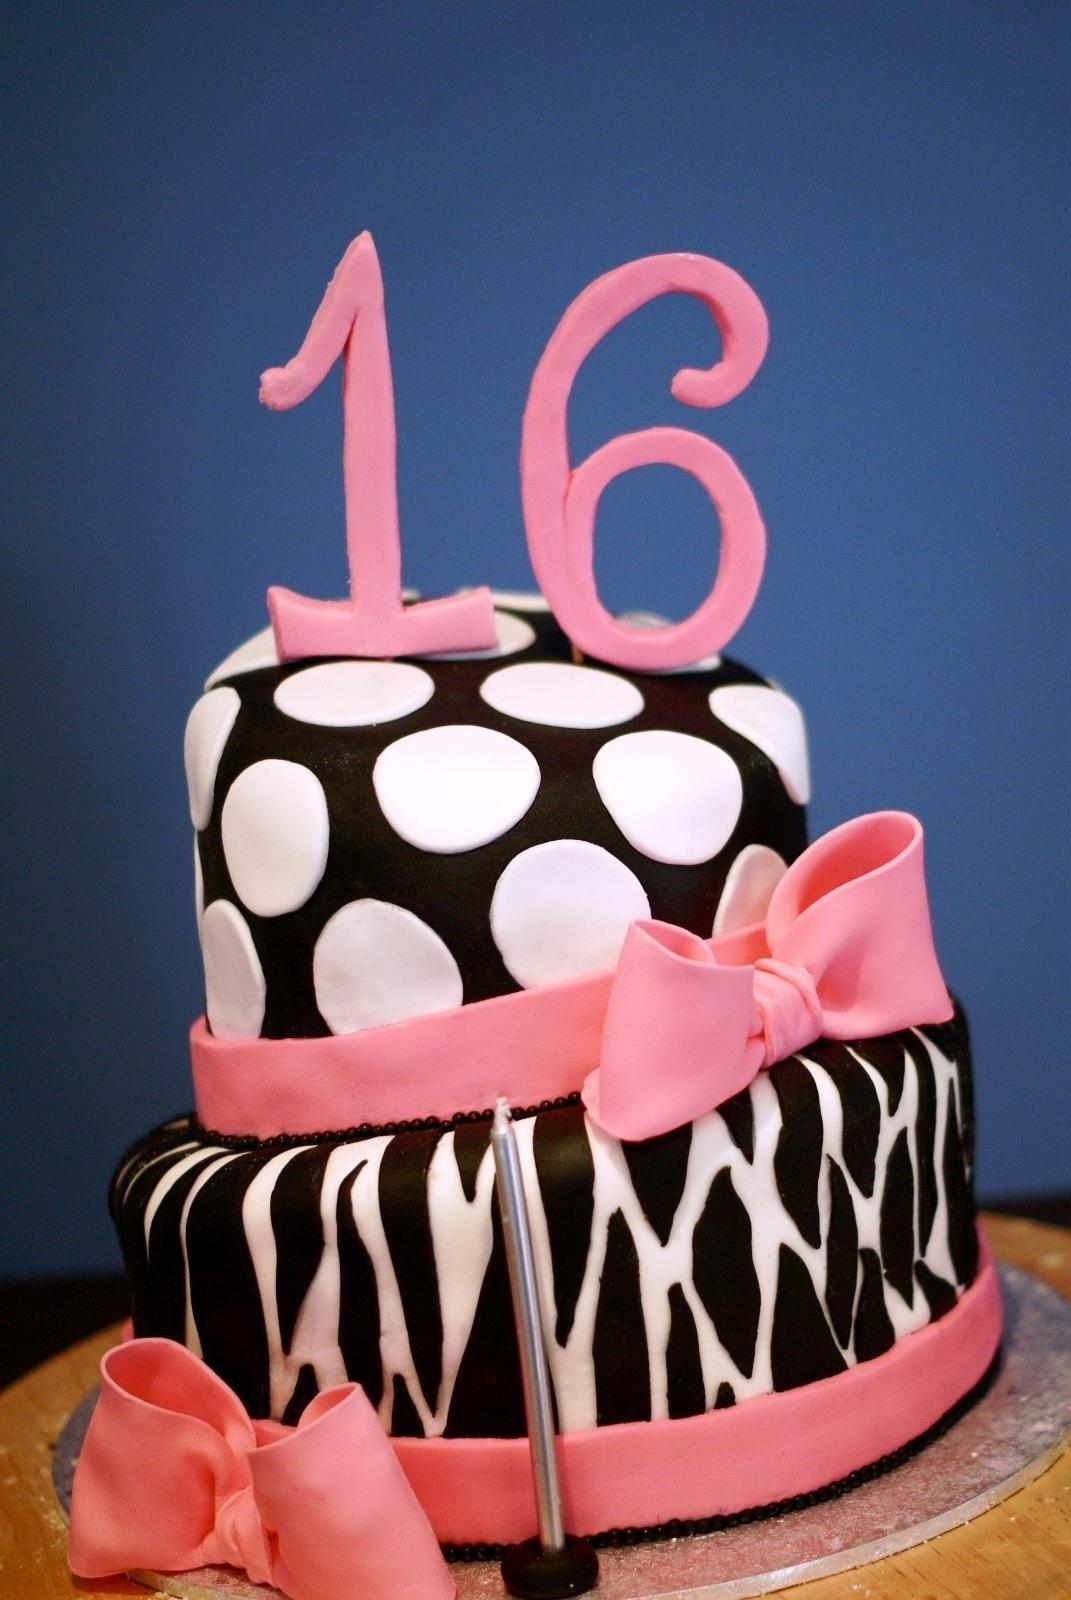 10 Ideal 16Th Birthday Cake Ideas For Boys birthday cakes images fascinating 16th birthday cakes sweet 16 cake